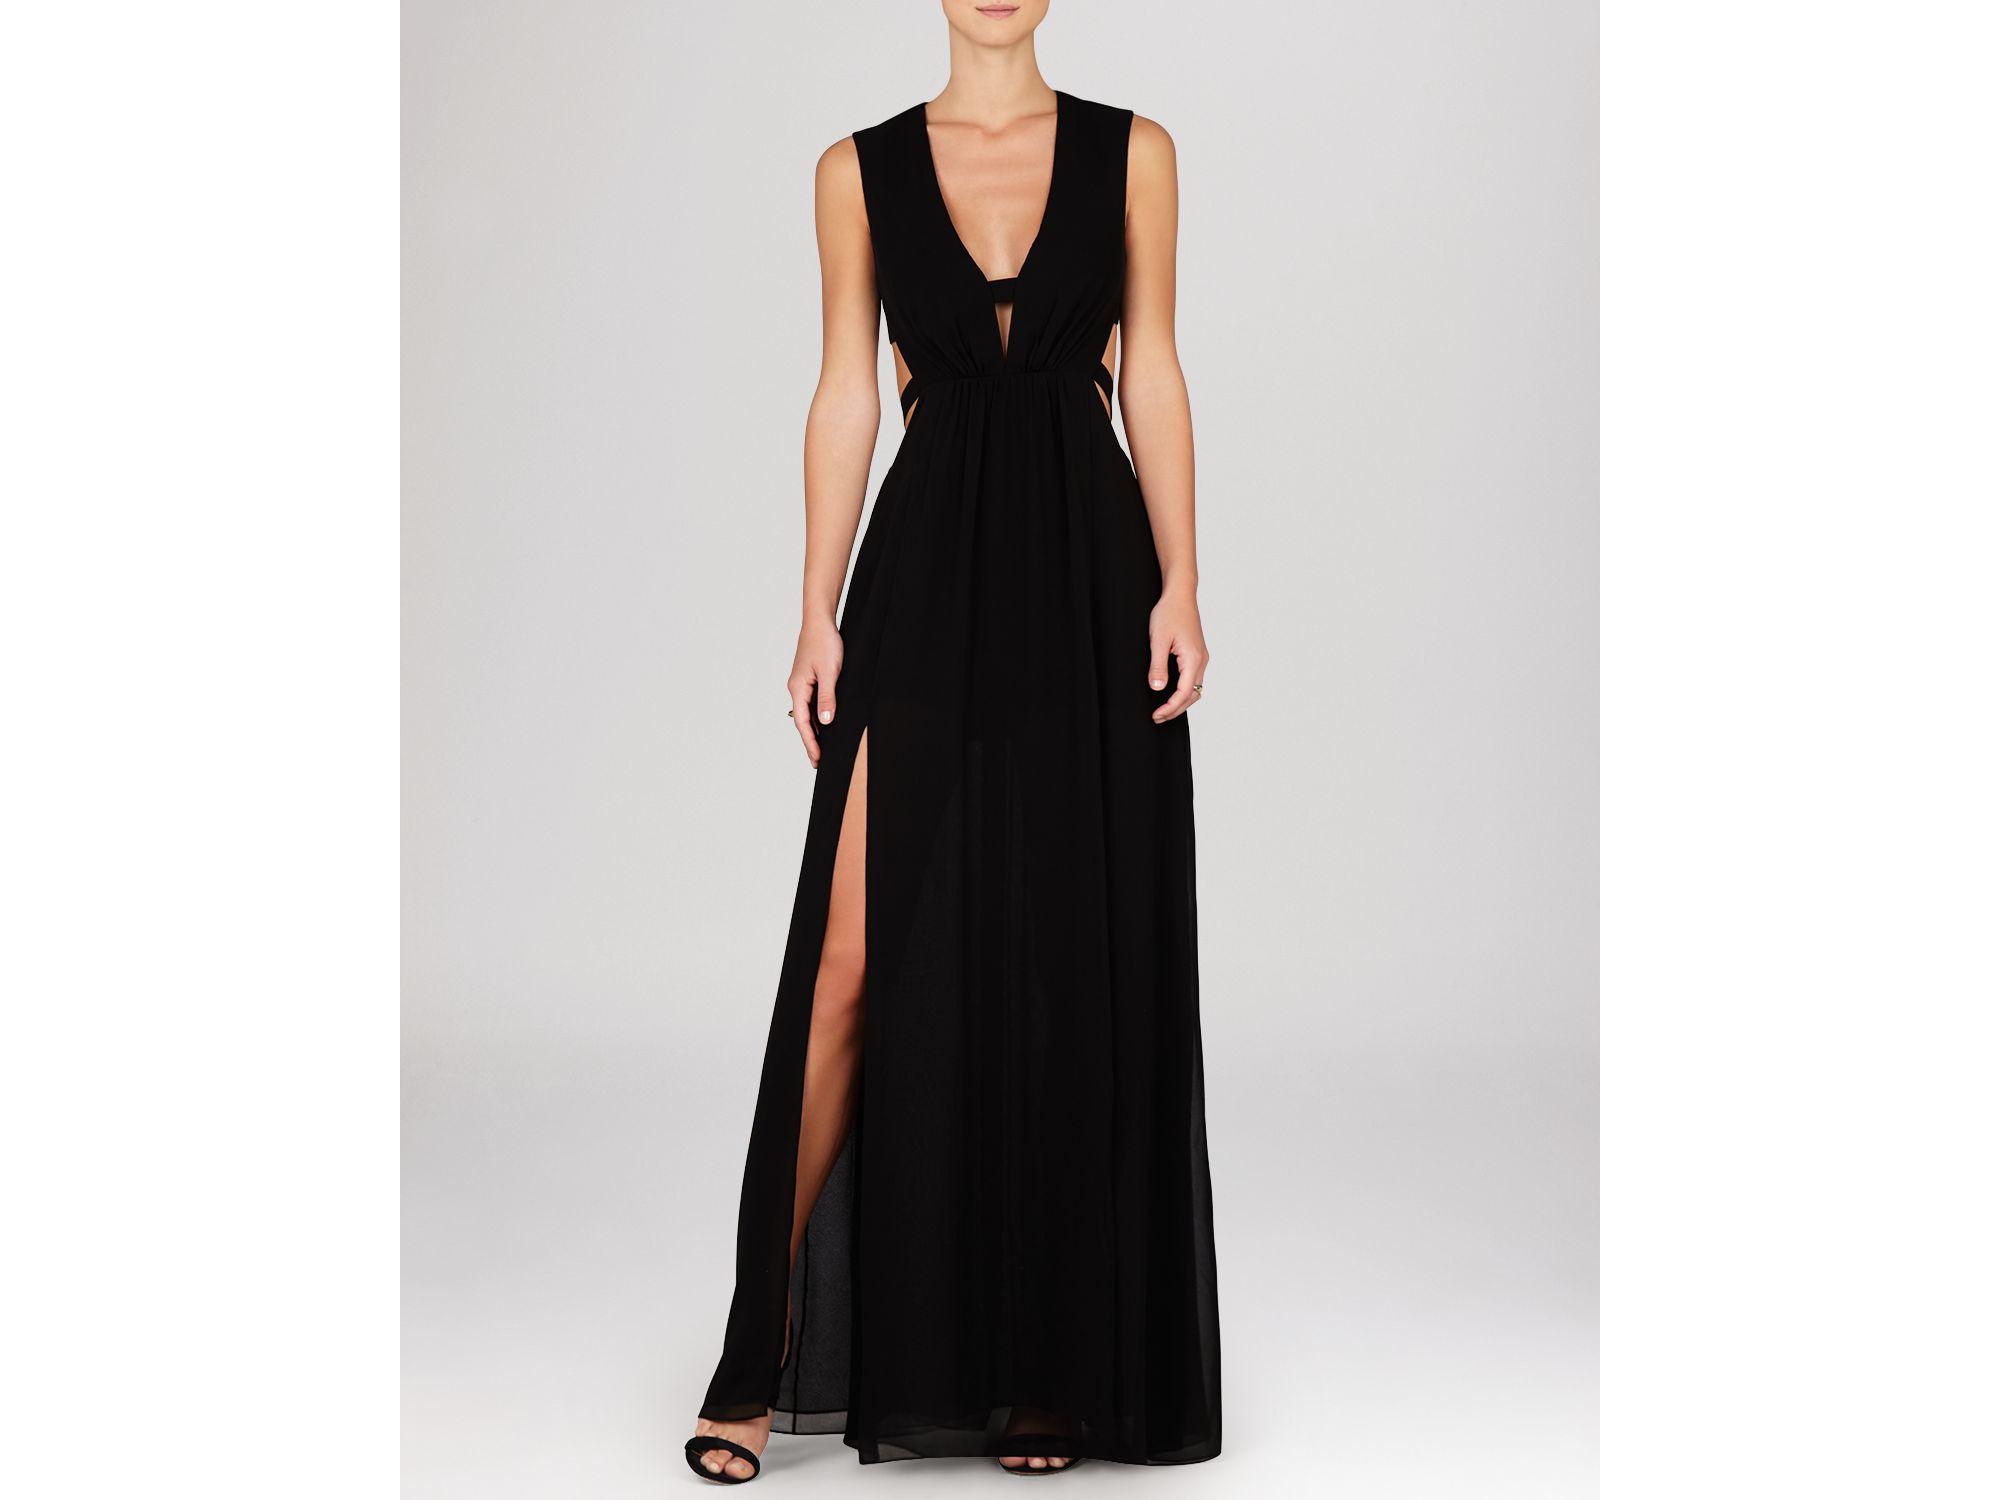 Lyst - Bcbgmaxazria Gown - Ava Sleeveless Deep V-neck Cutout in Black